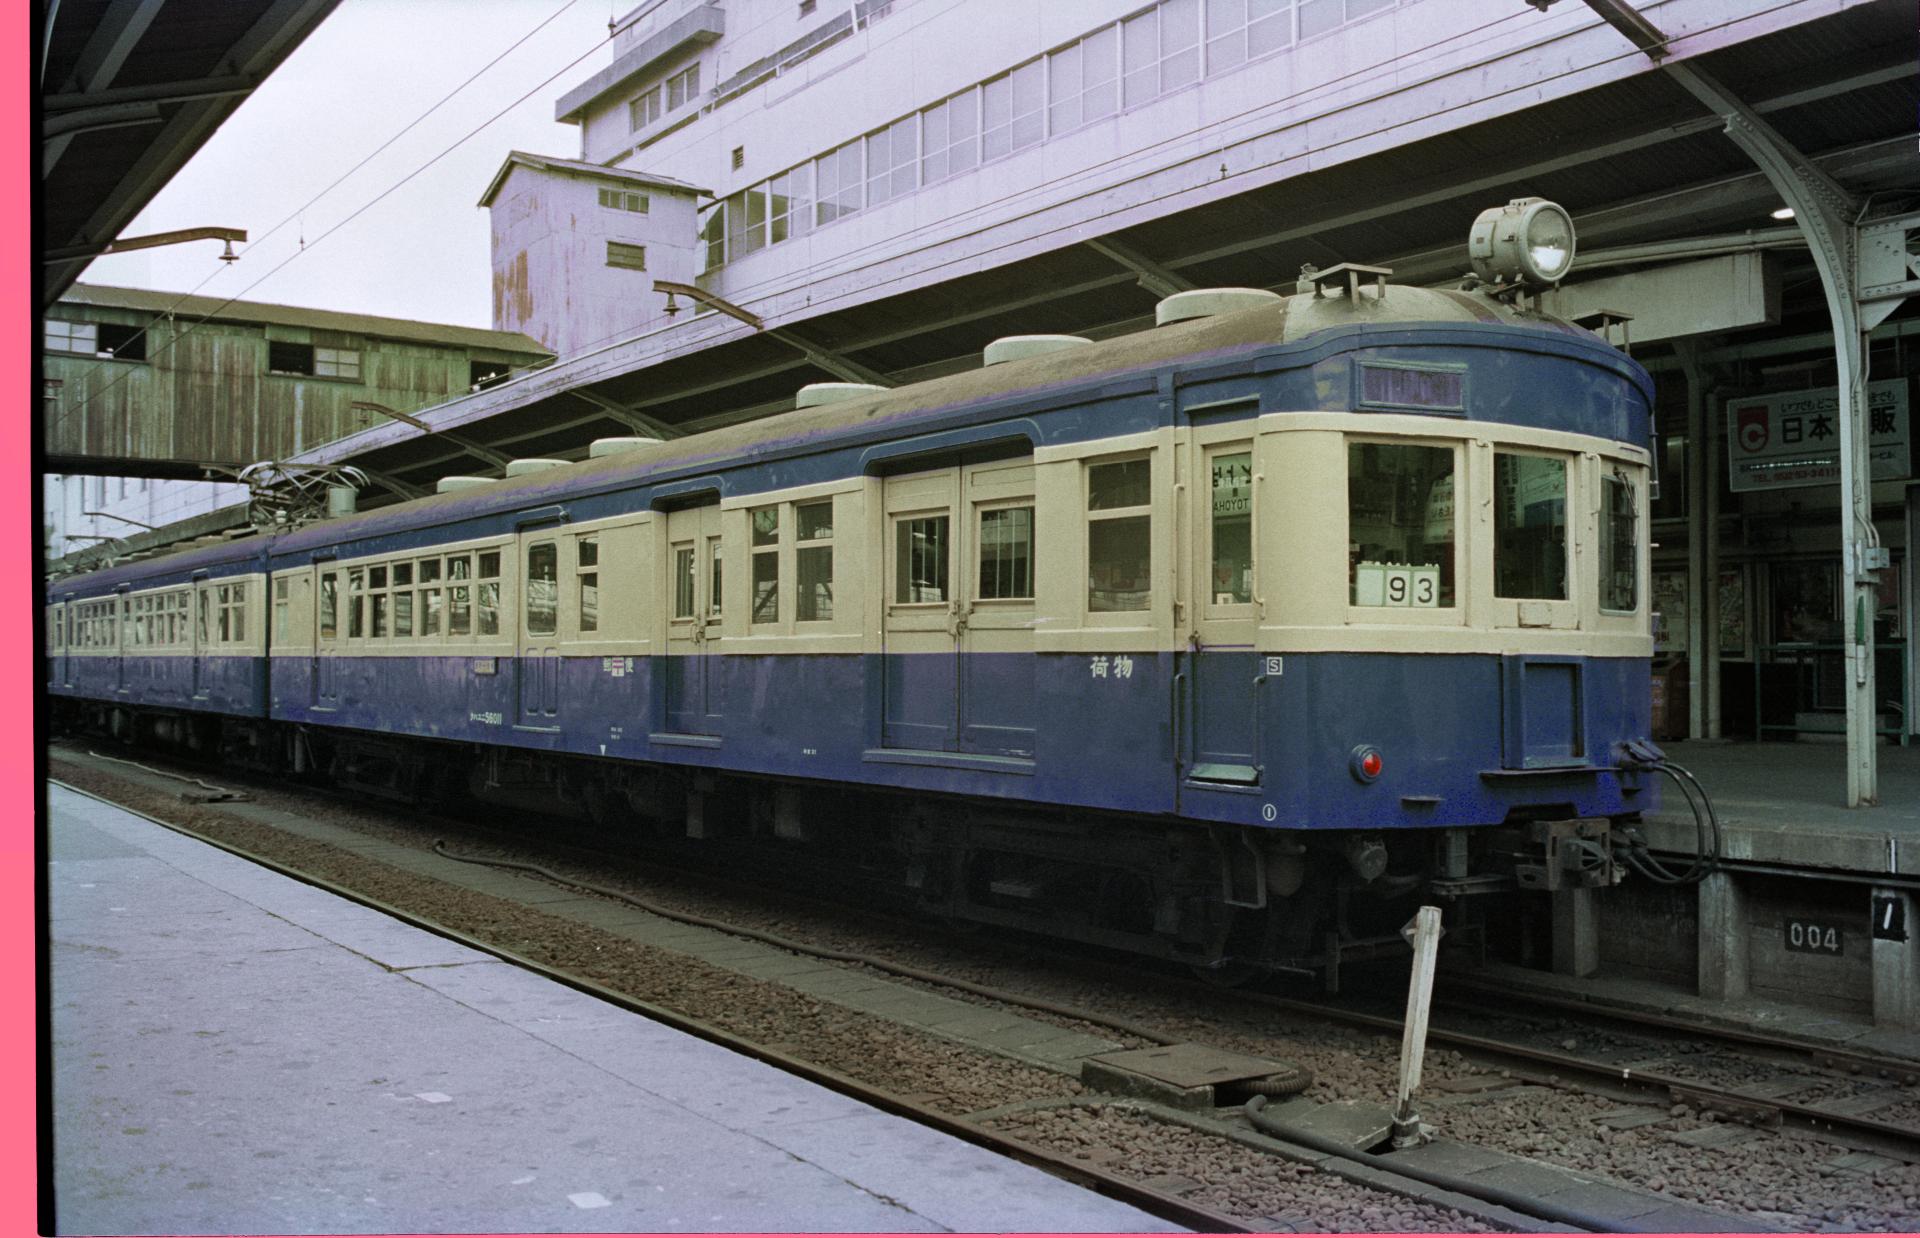 f:id:yasuo_ssi:20210605011911p:plain